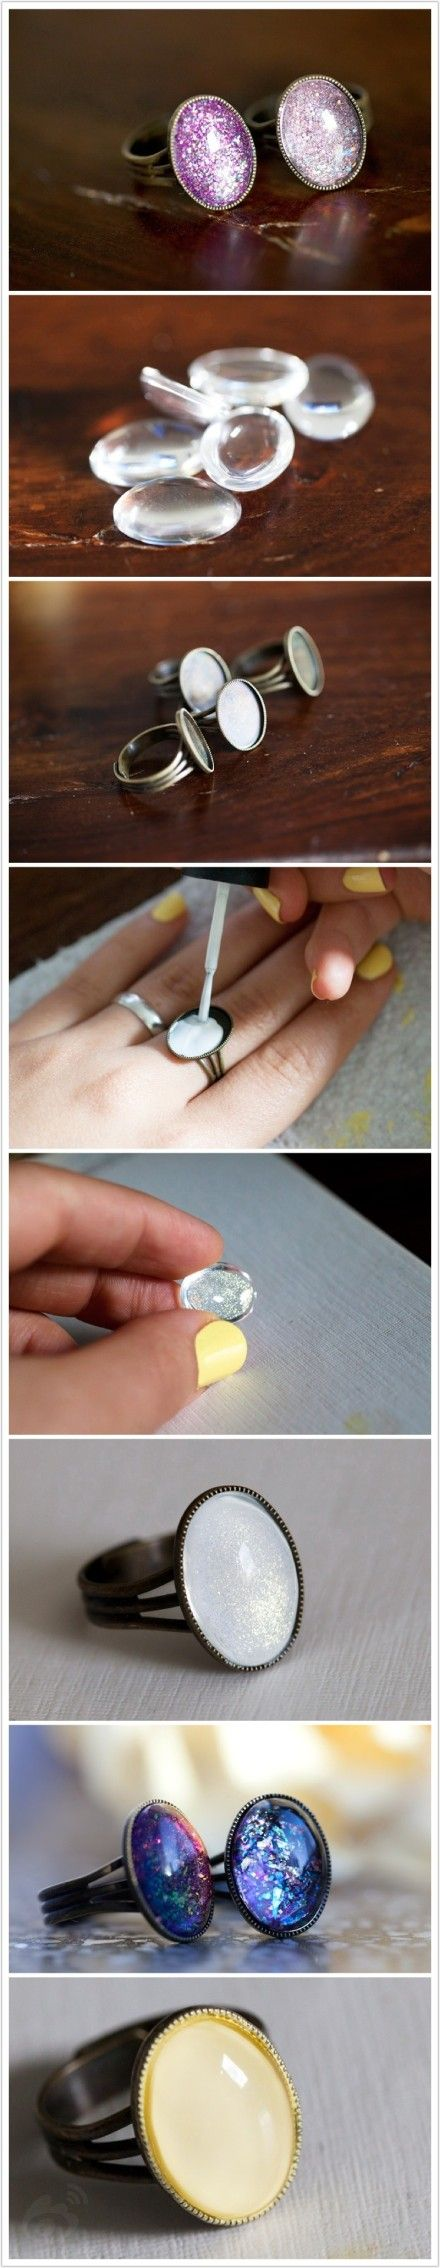 DIY: with ring base & mancala pieces.